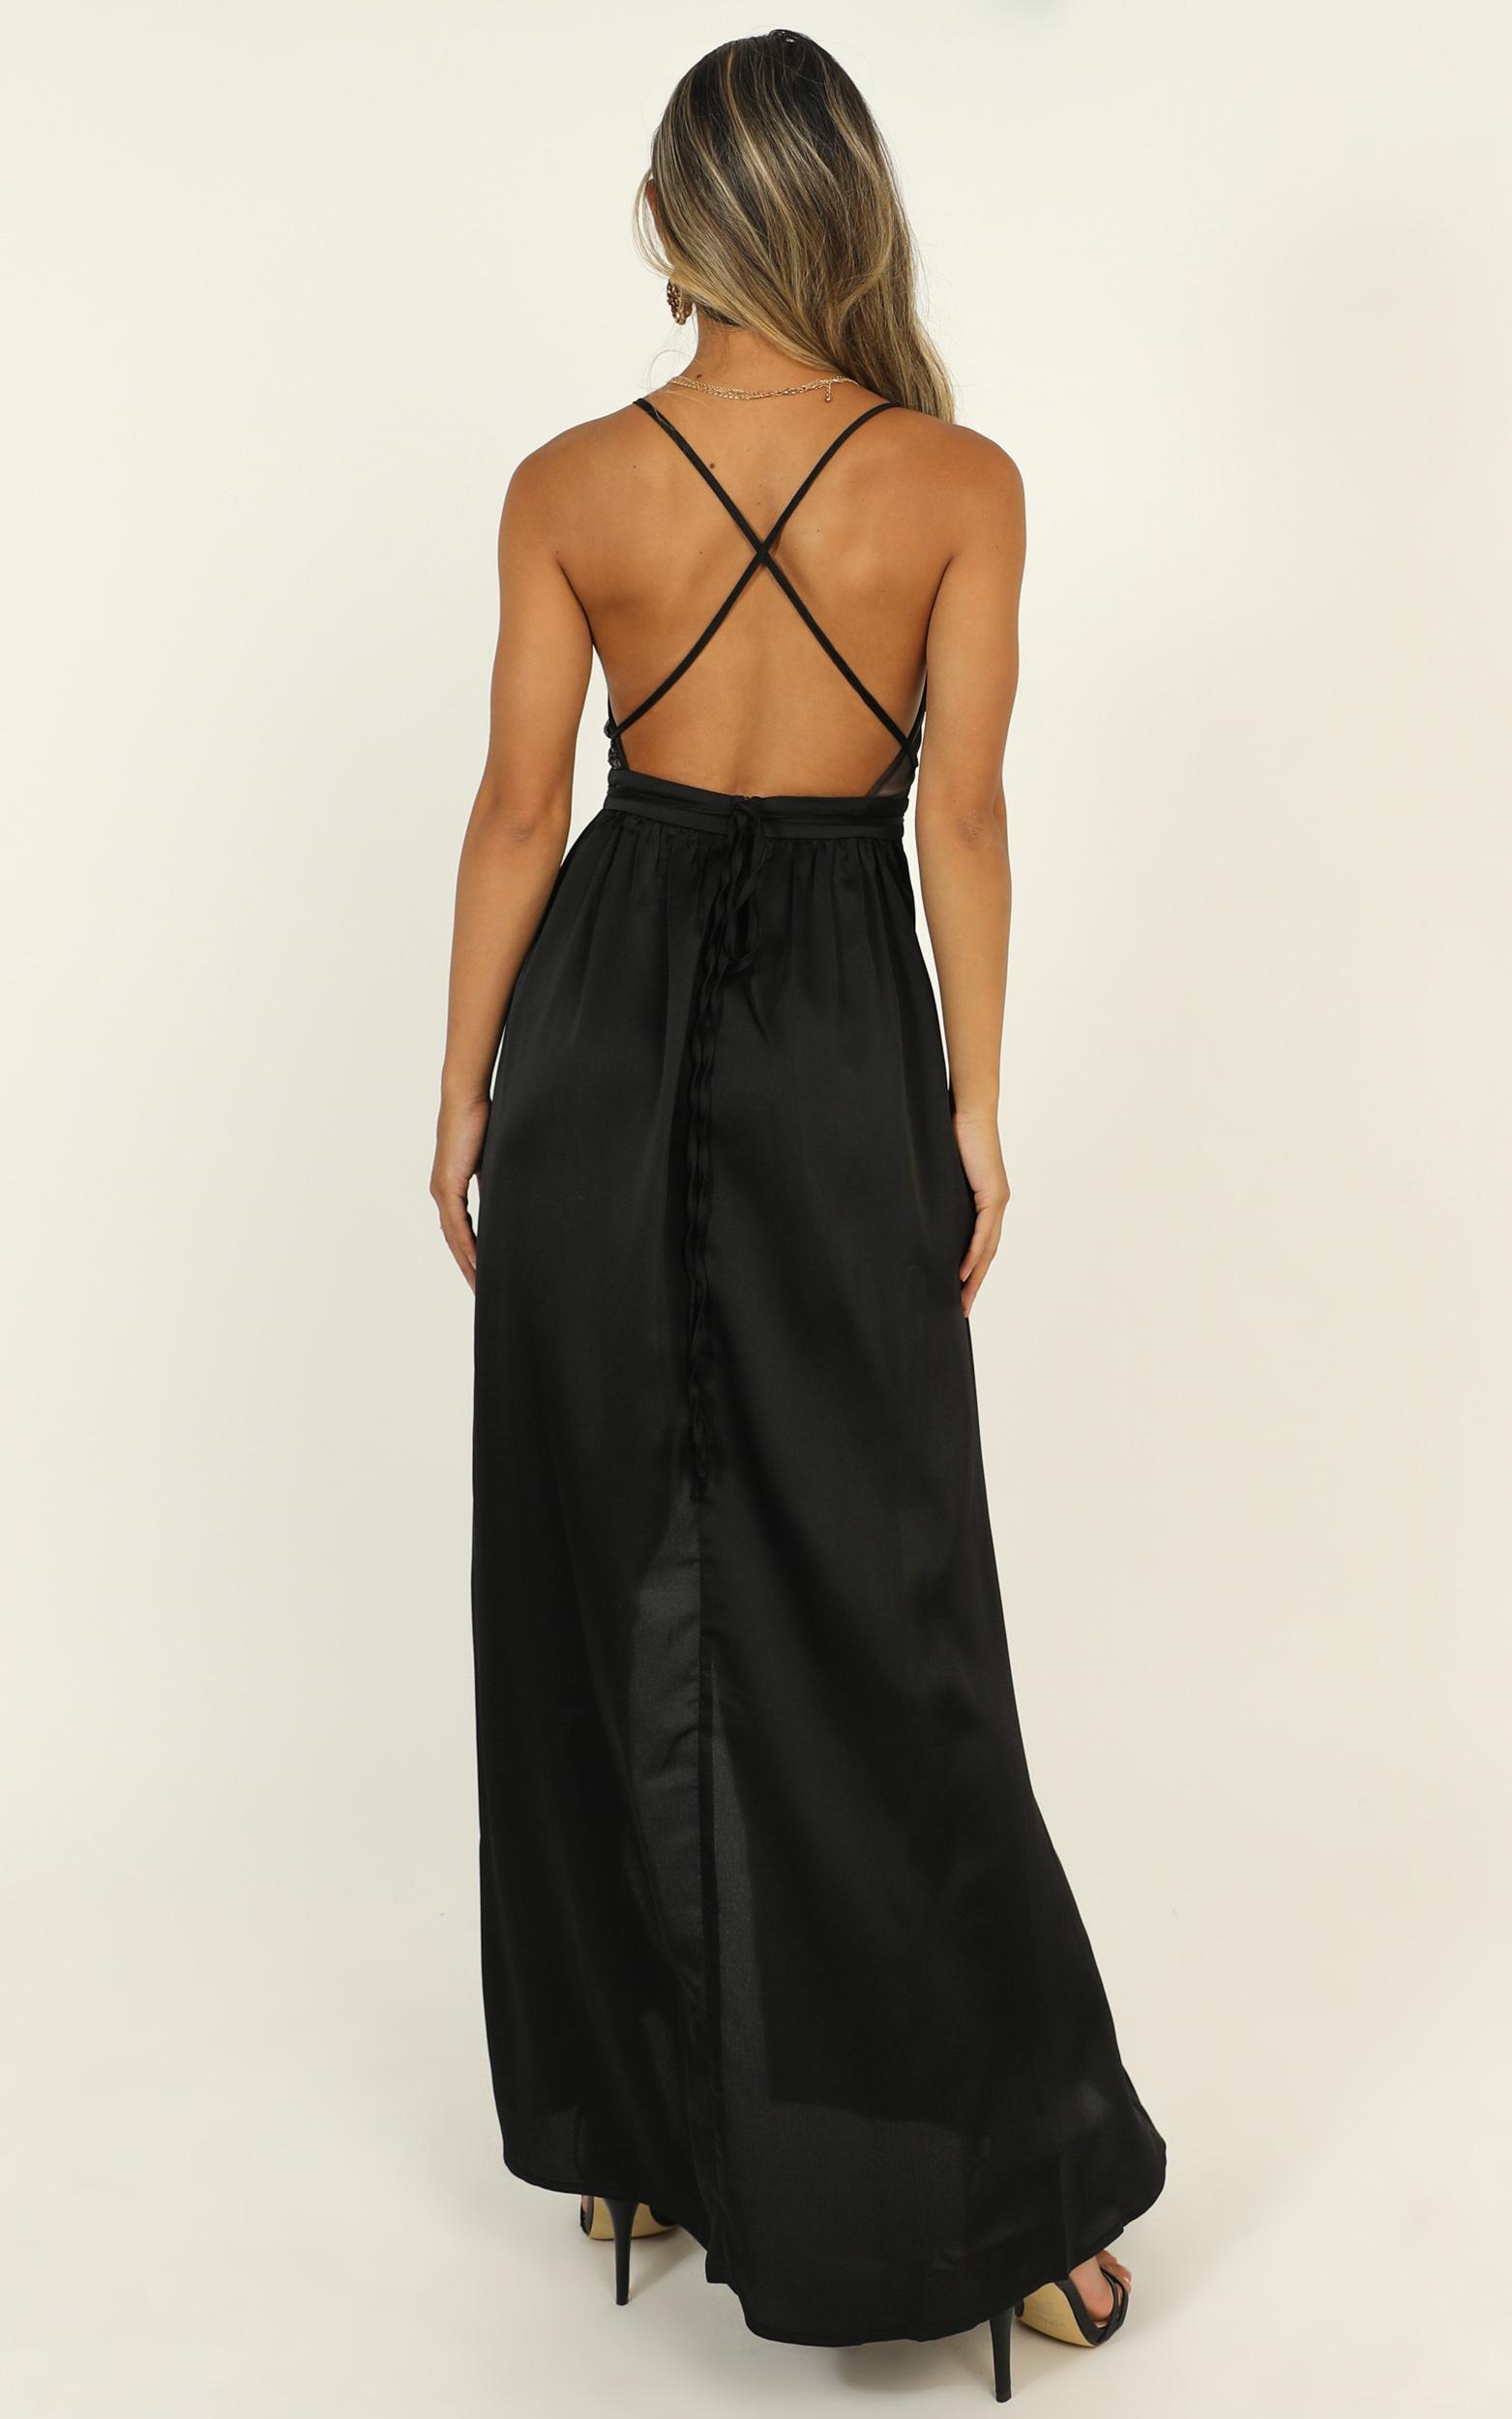 Fix You Maxi Dress In Black - 16 (XXL), Black, hi-res image number null